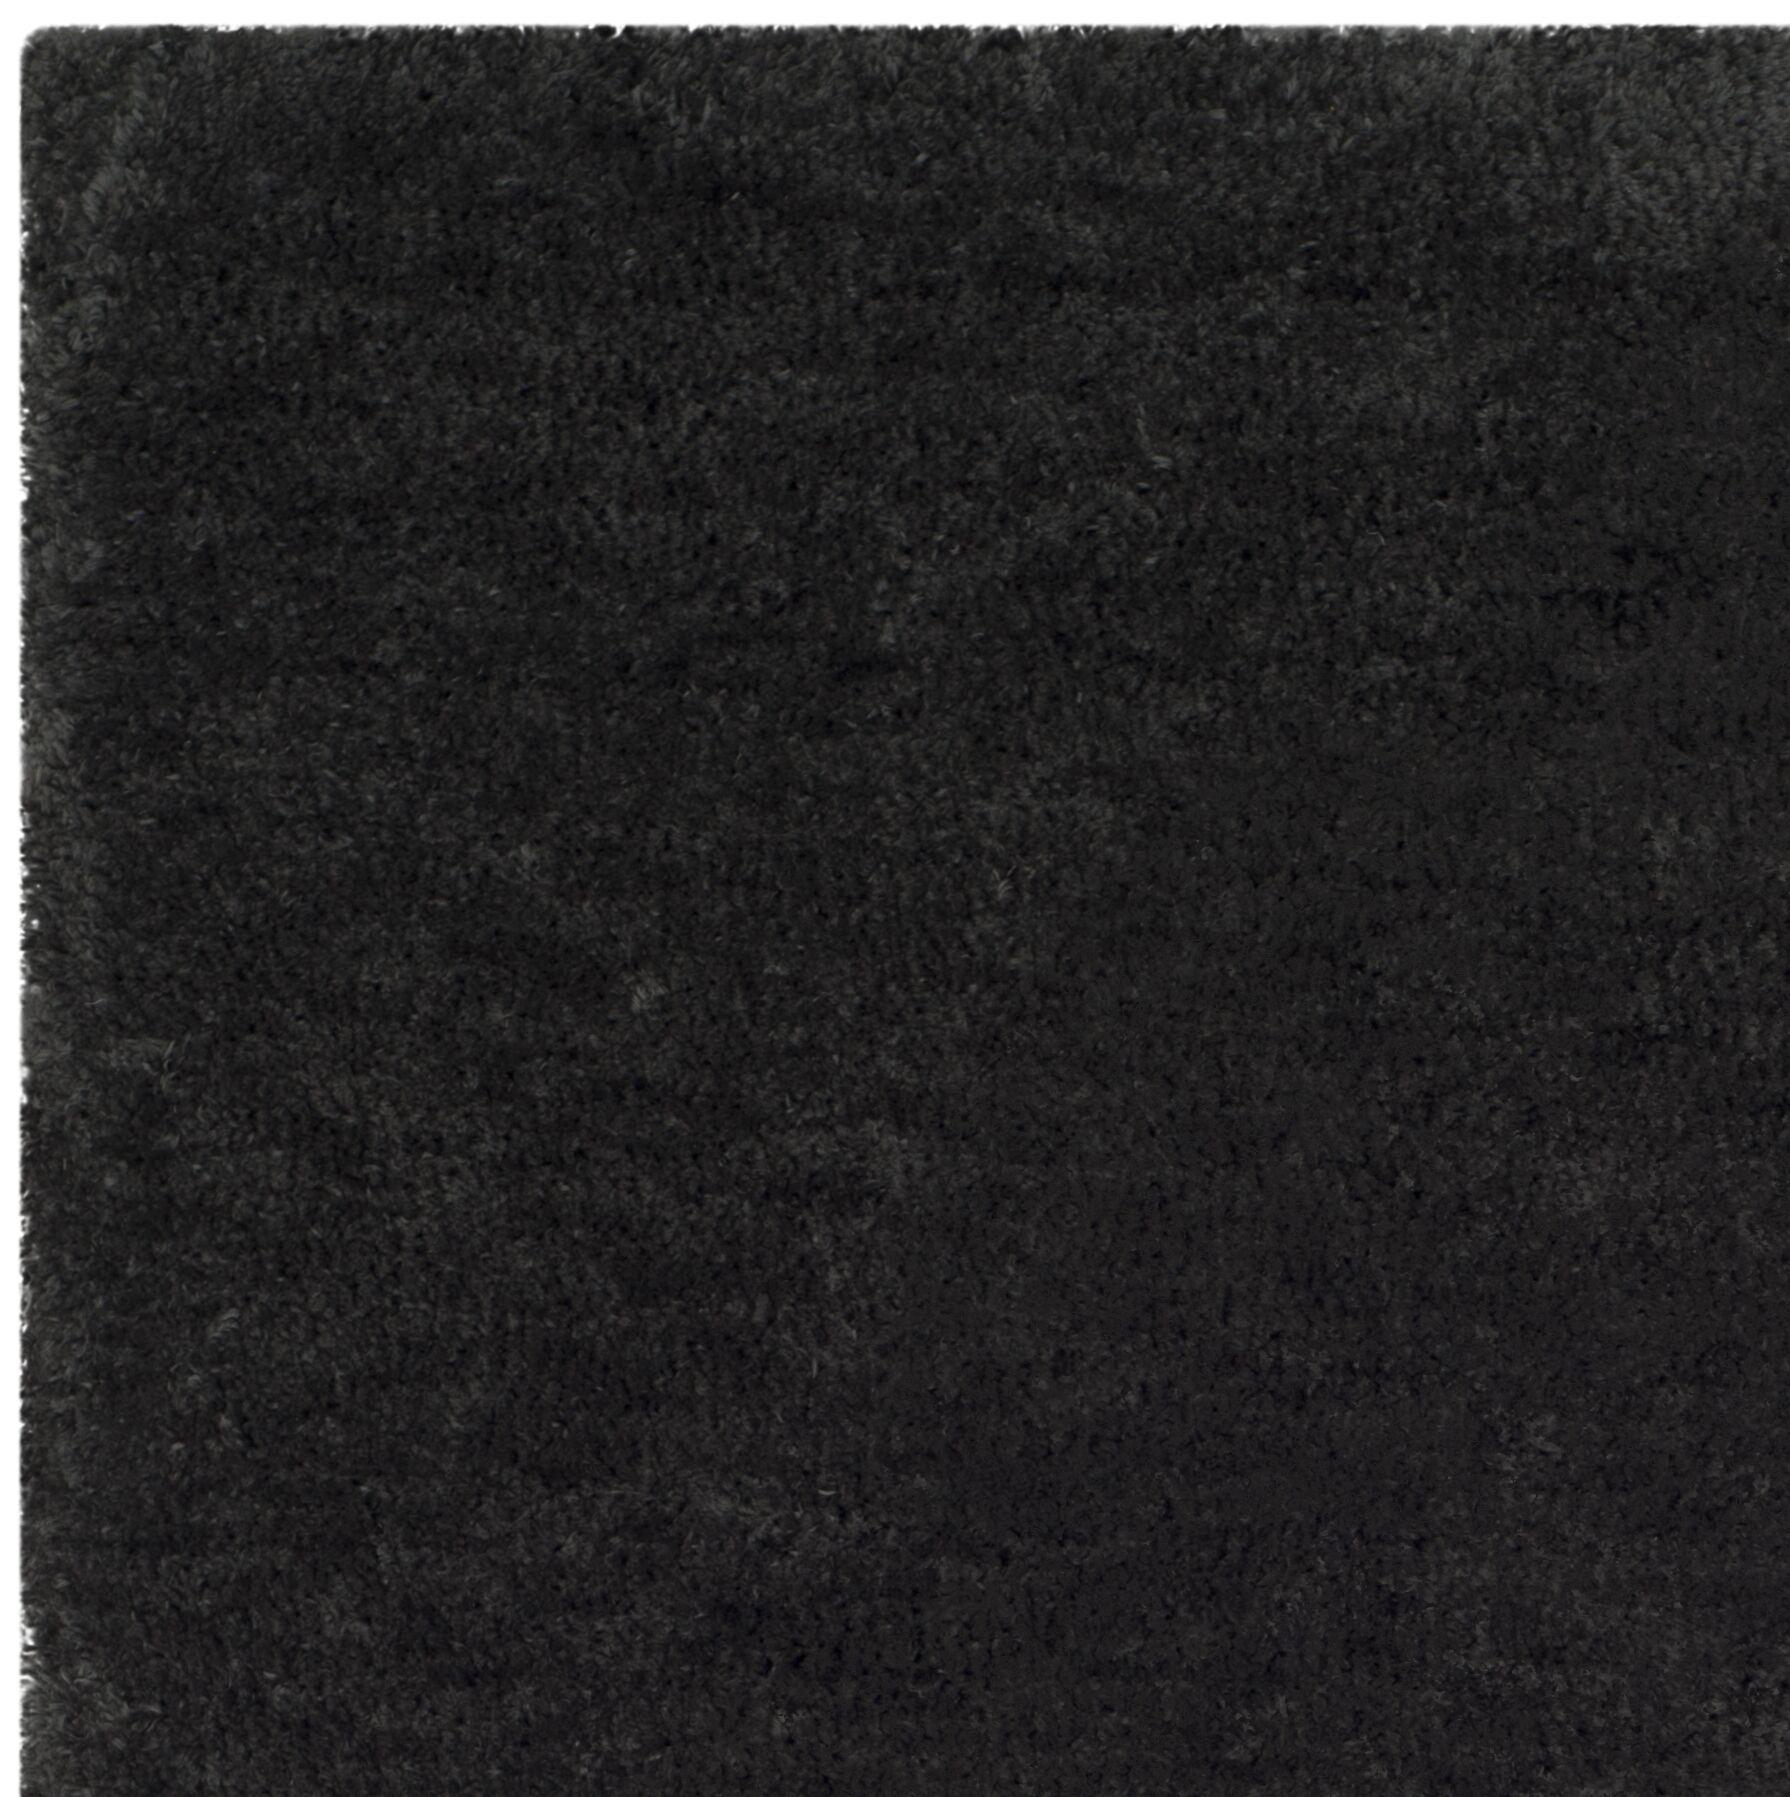 Detweiler Hand-Tufted Charcoal Area Rug Rug Size: Square 6'